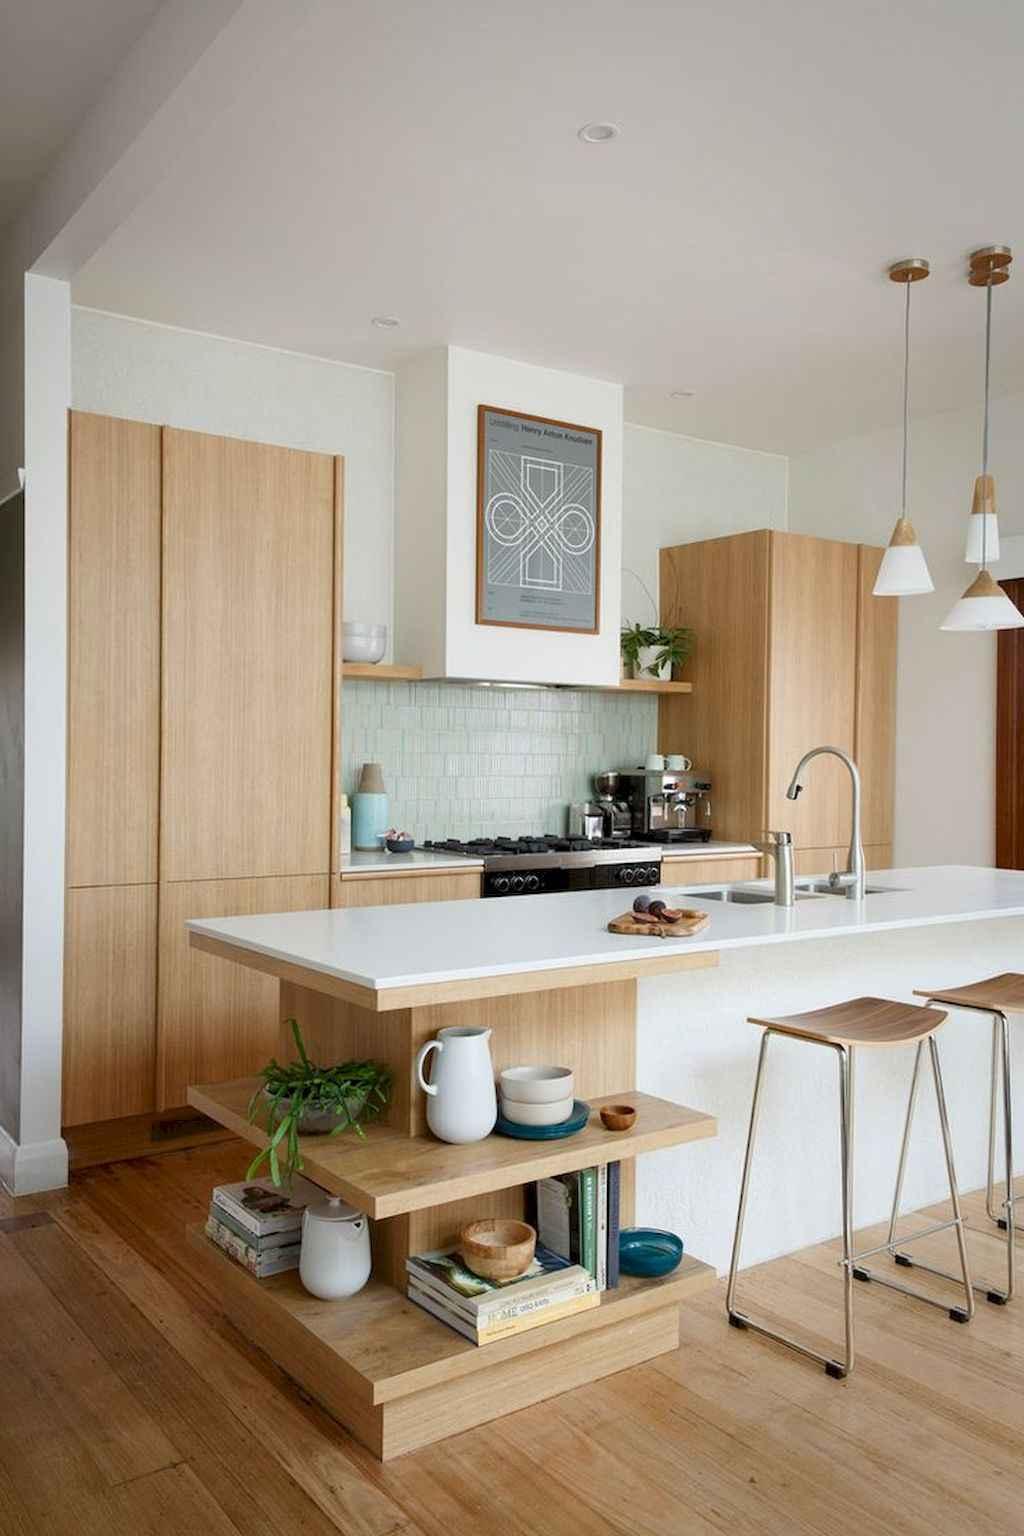 Mid century modern kitchen design ideas (12)